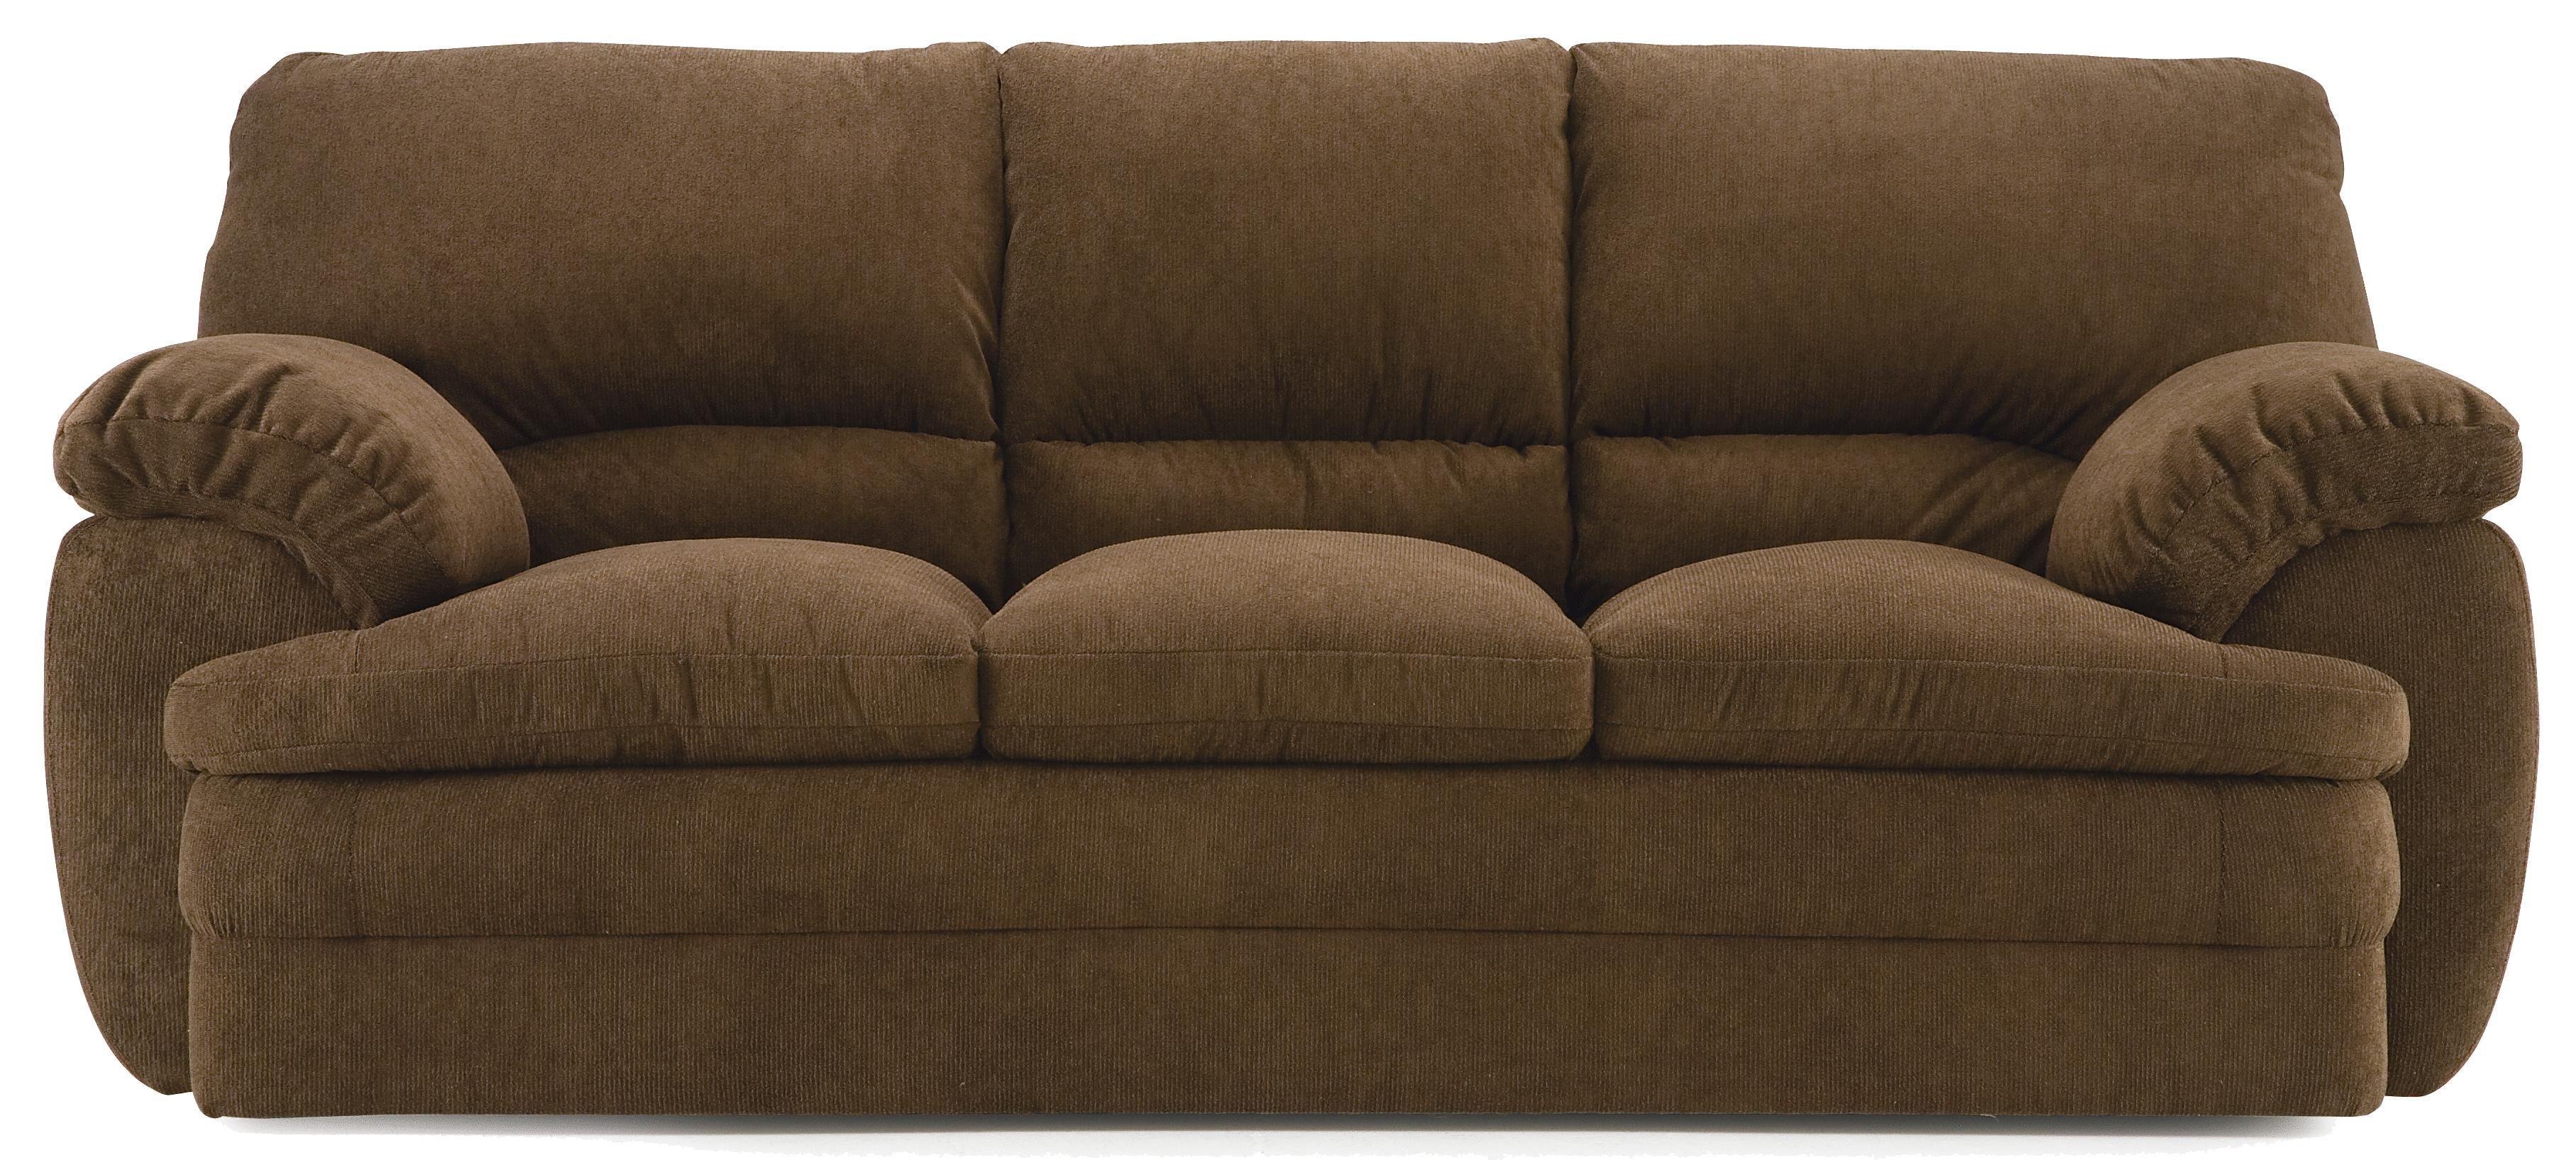 palliser marcella pillow top sofa ahfa sofa dealer locator